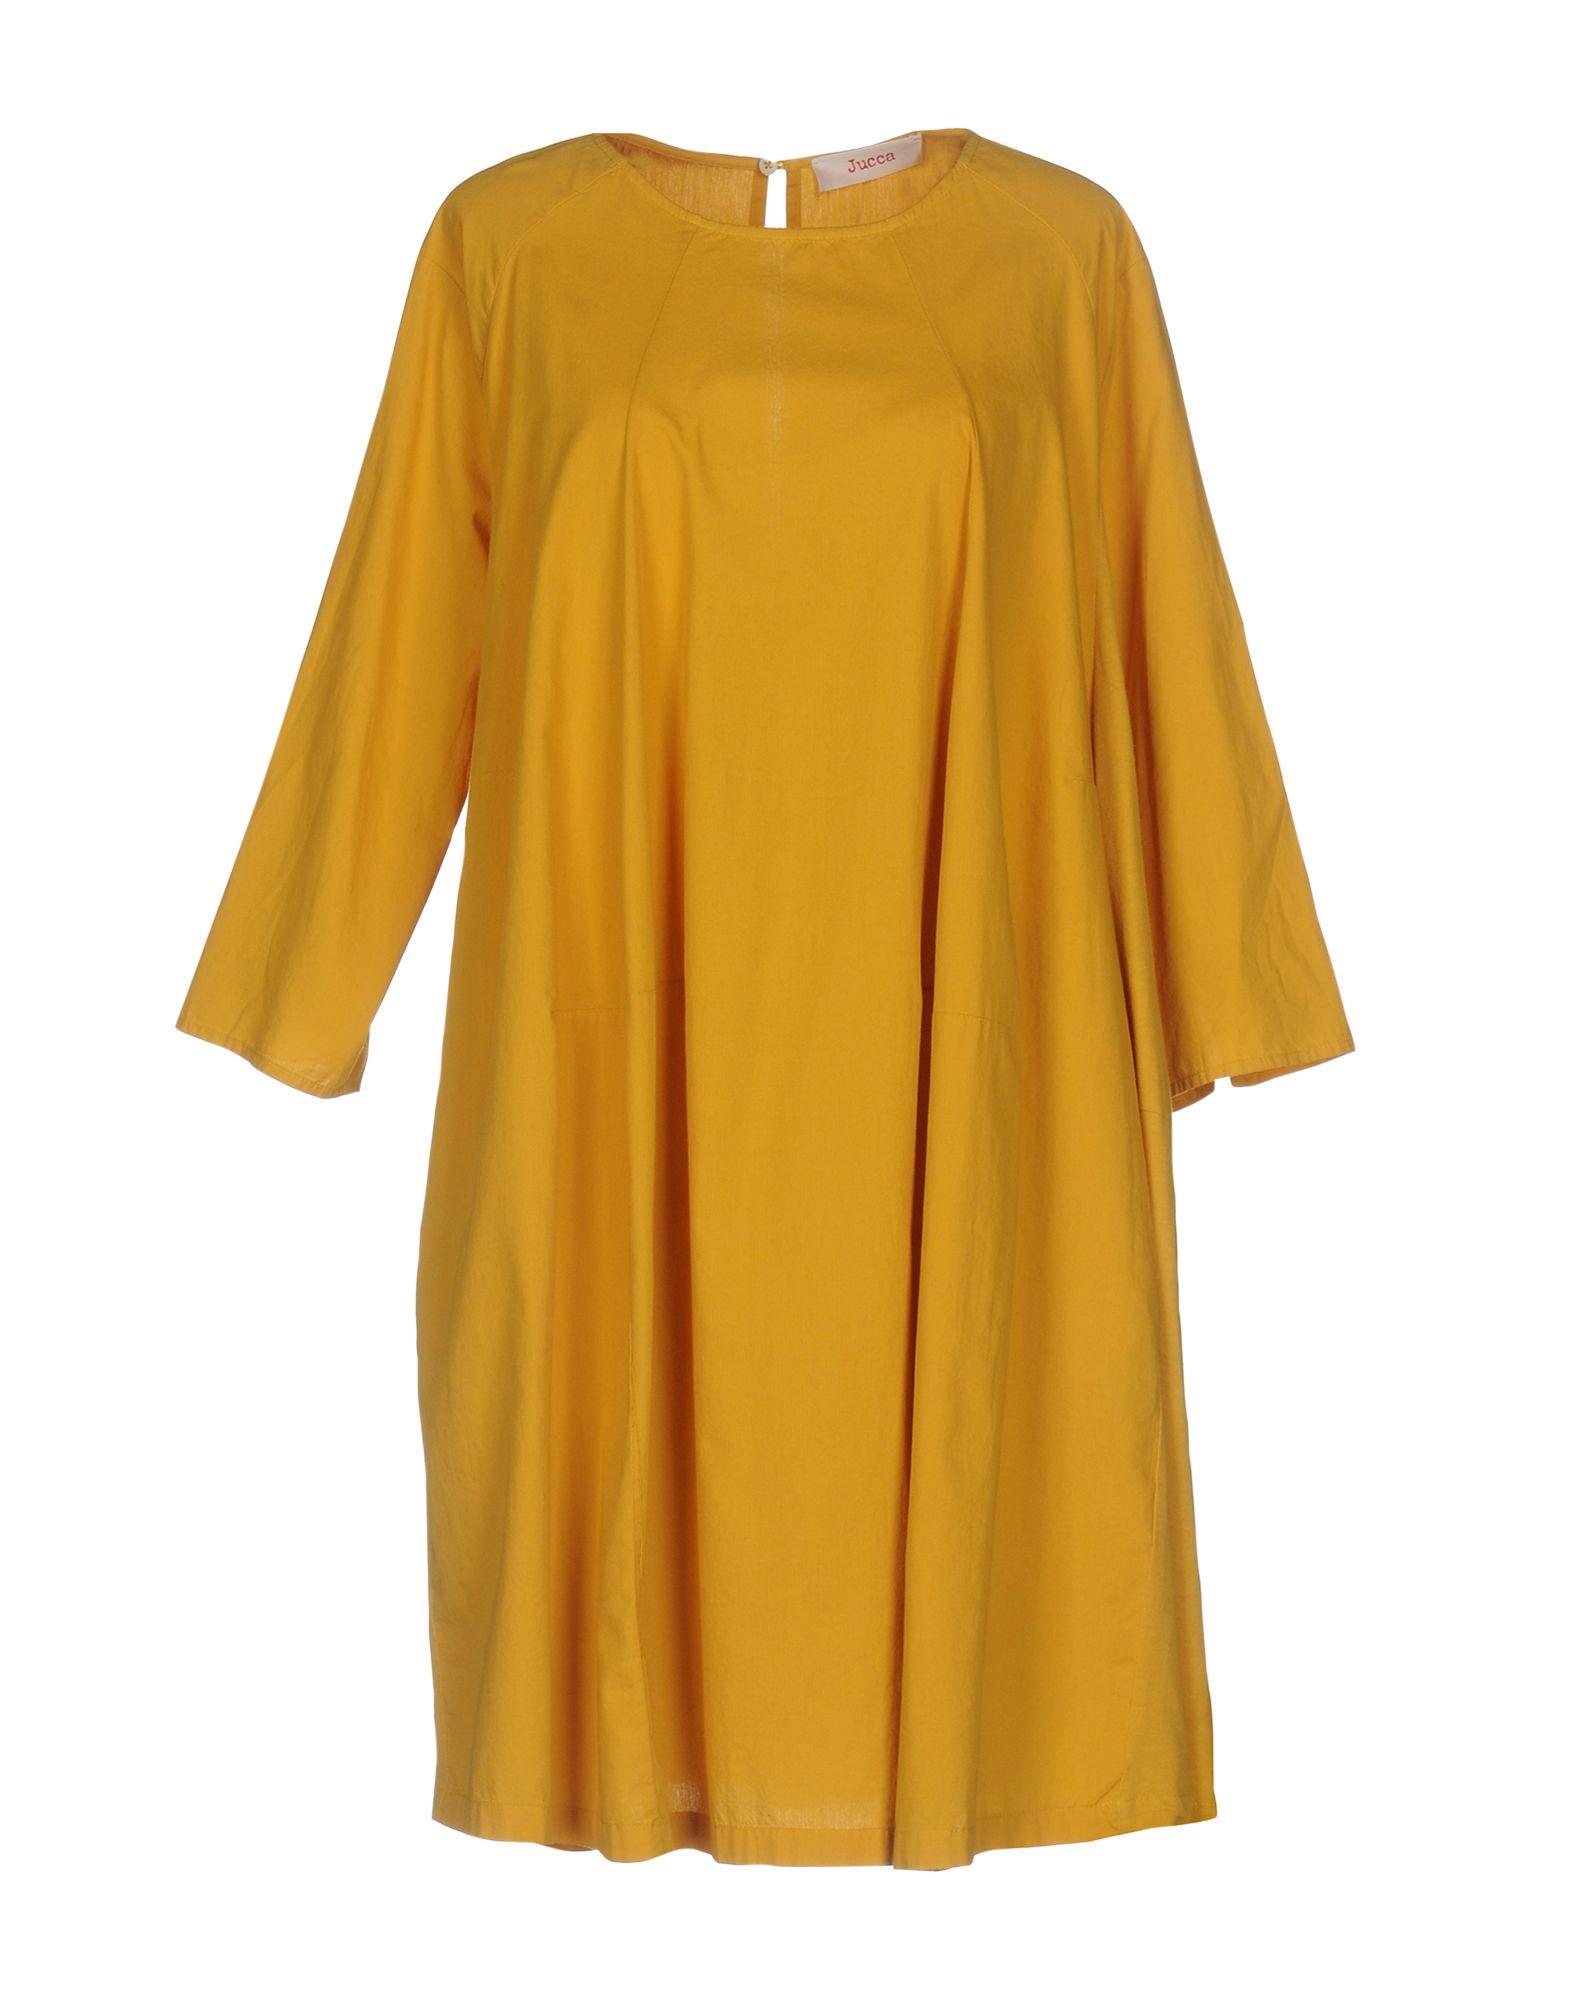 JUCCA Damen Kurzes Kleid Farbe Ocker Größe 5 jetztbilligerkaufen